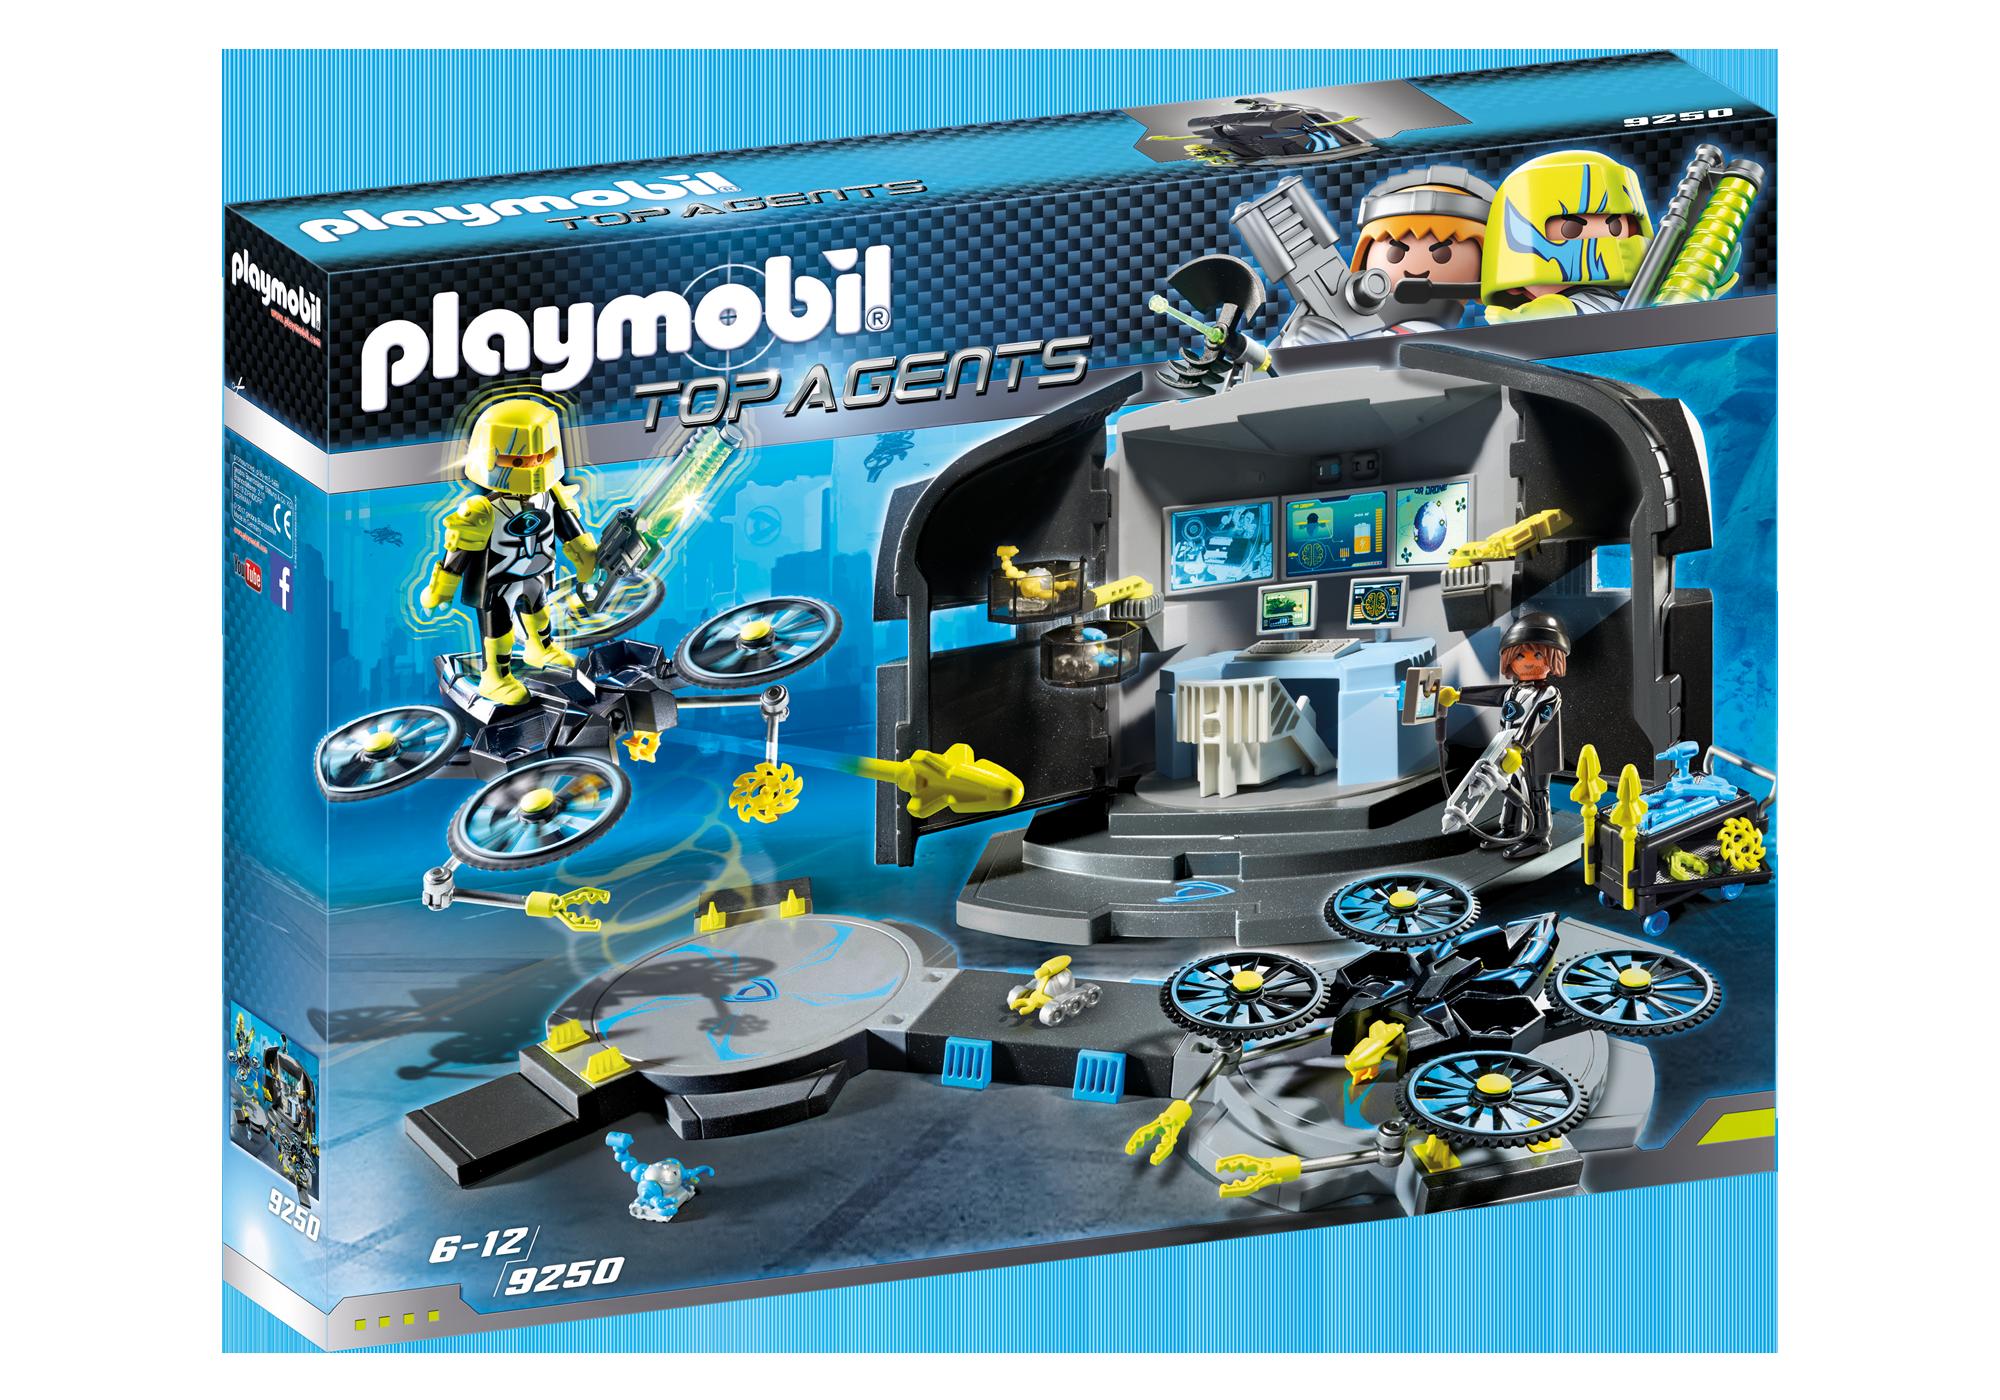 http://media.playmobil.com/i/playmobil/9250_product_box_front